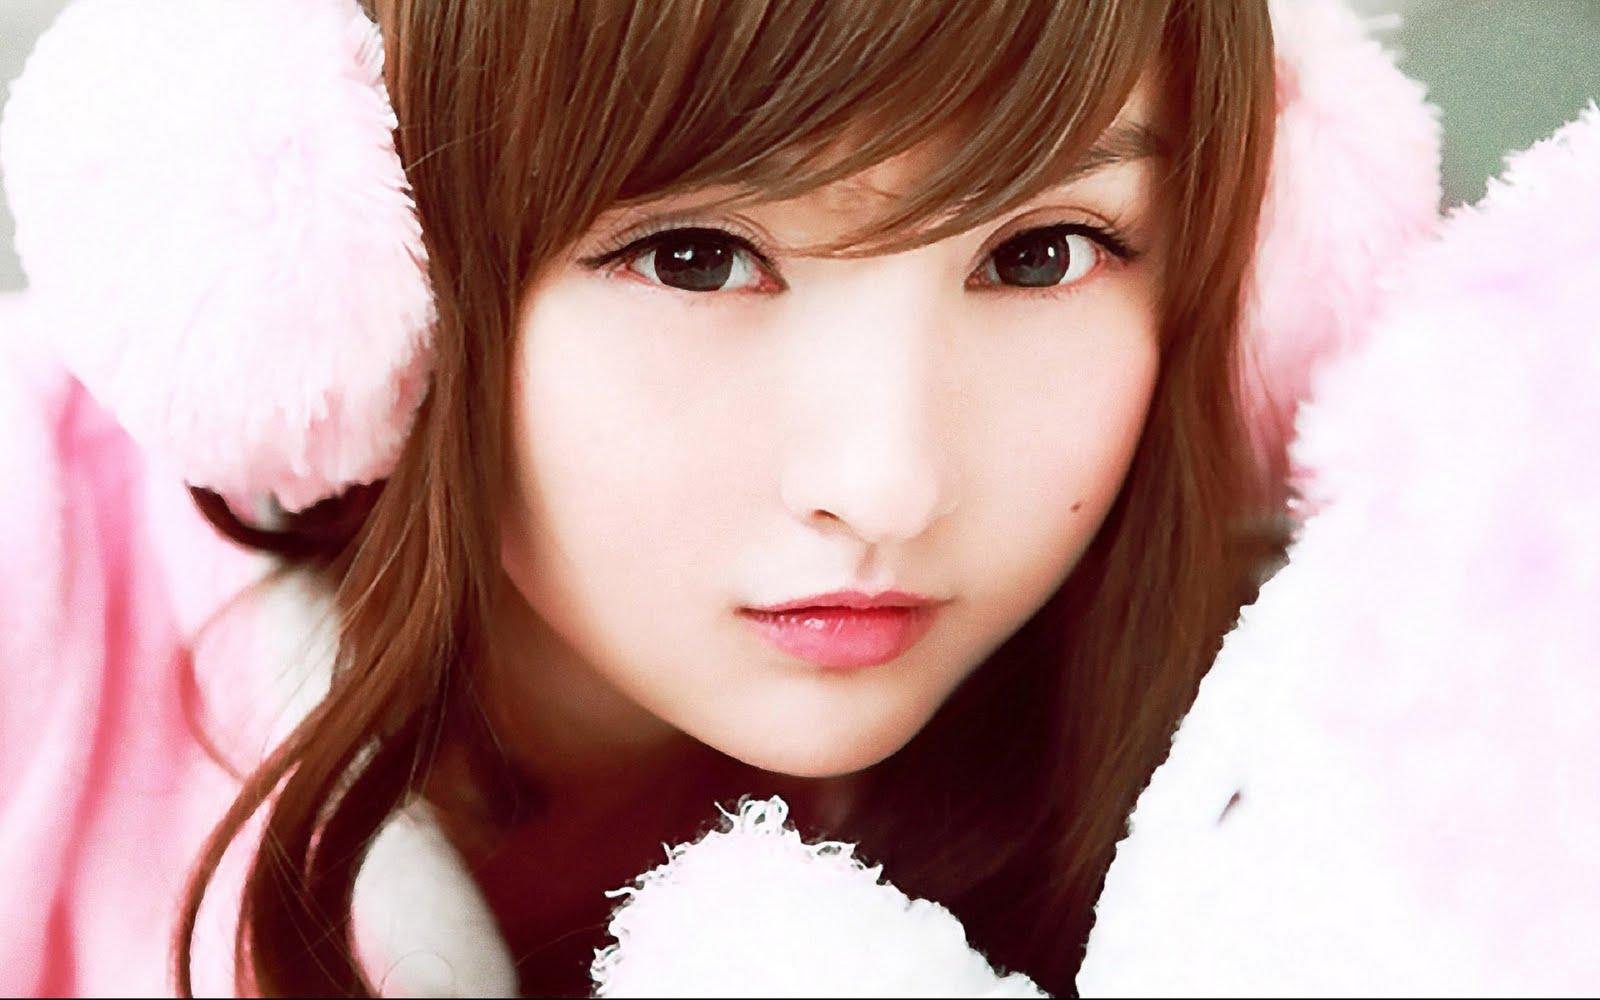 beautiful girl - photo #21